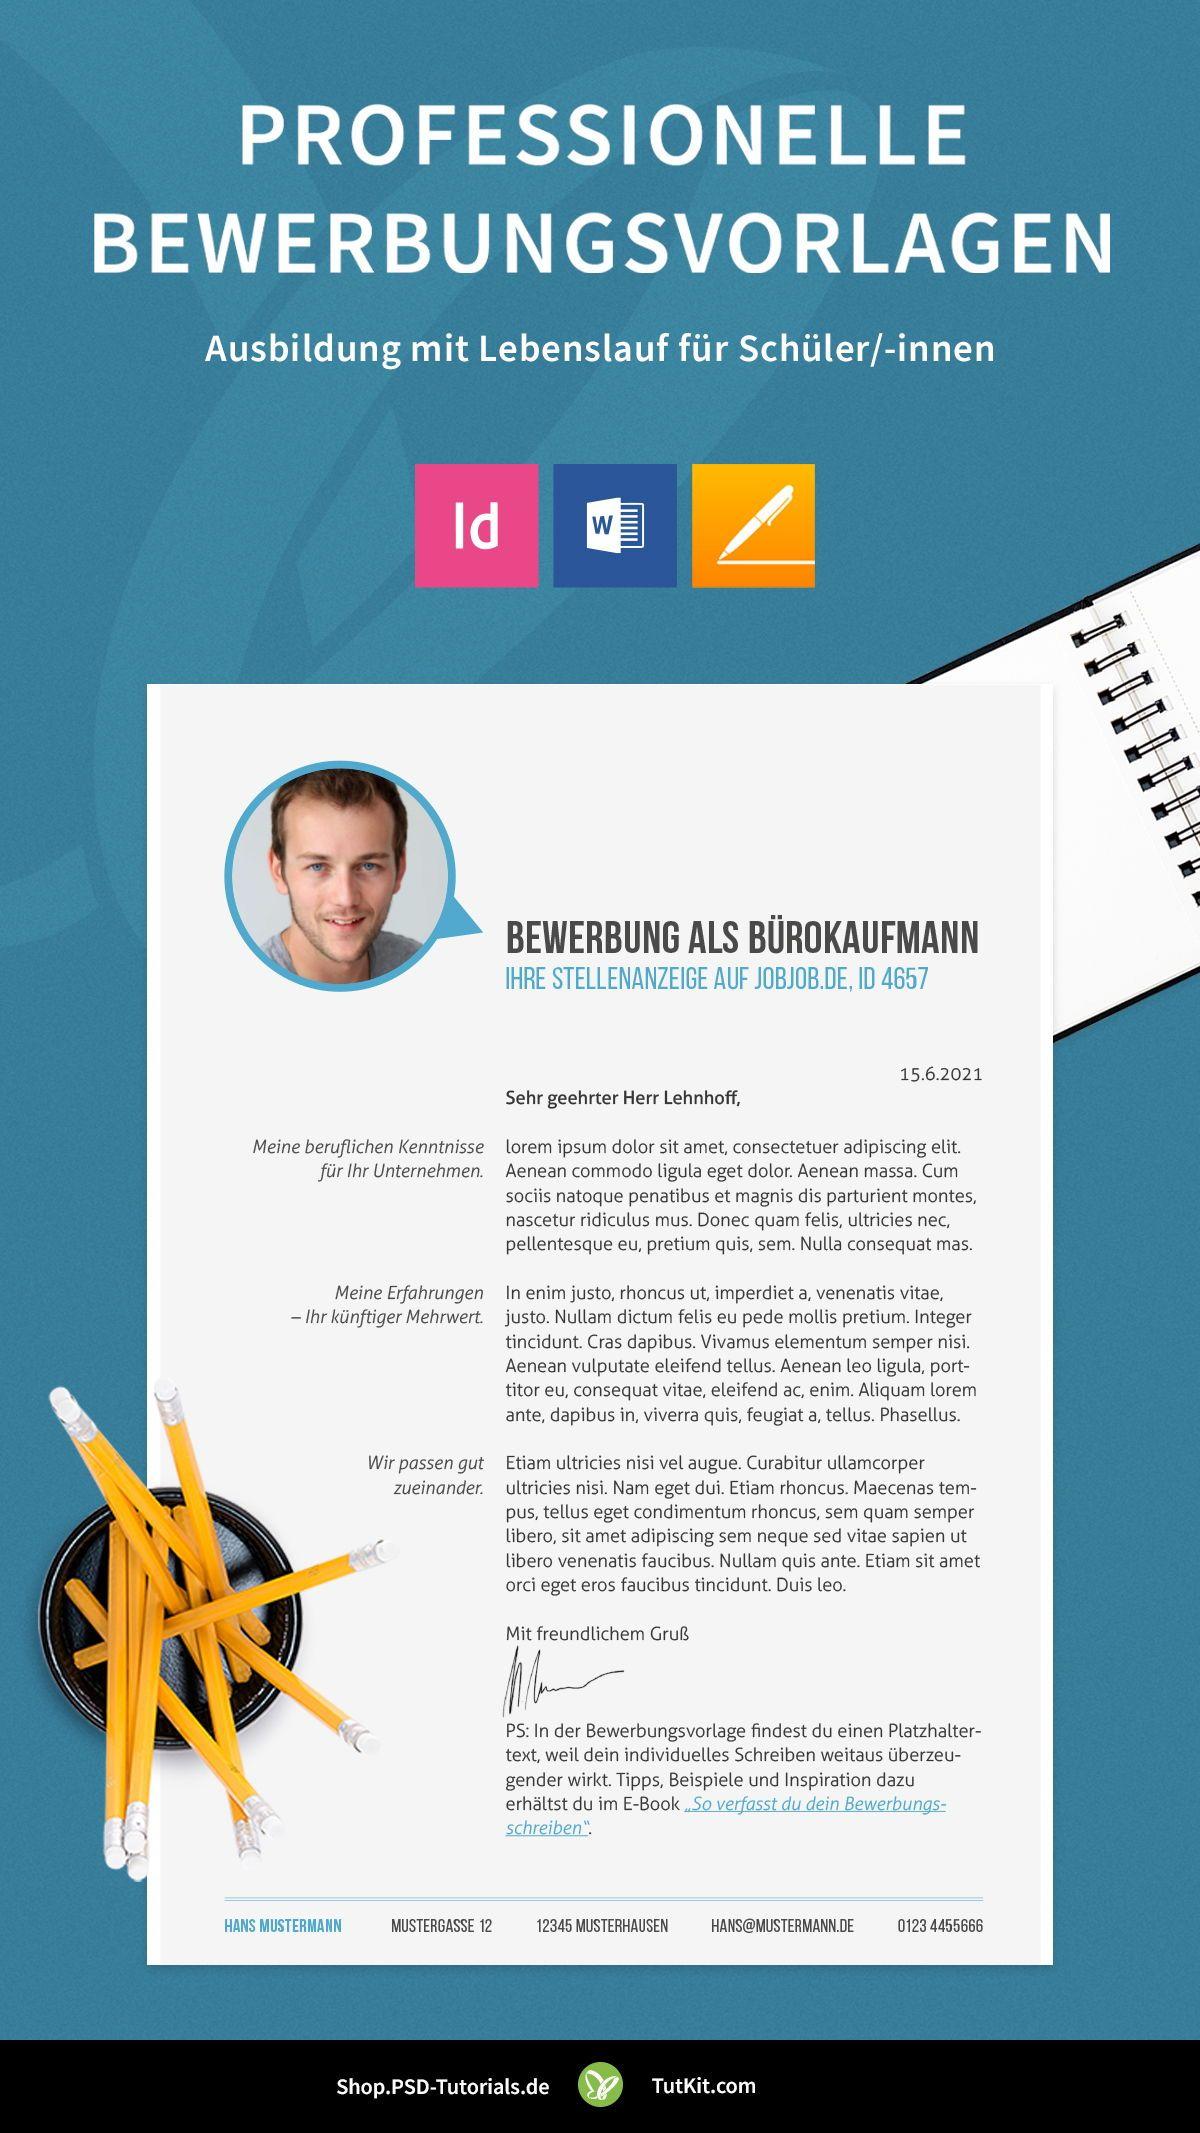 Bewerbung Als Burokauffrau Burokaufmann Design Muster Download Bewerbung Als Burokauffrau Lebenslauf Bewerbung Lebenslauf